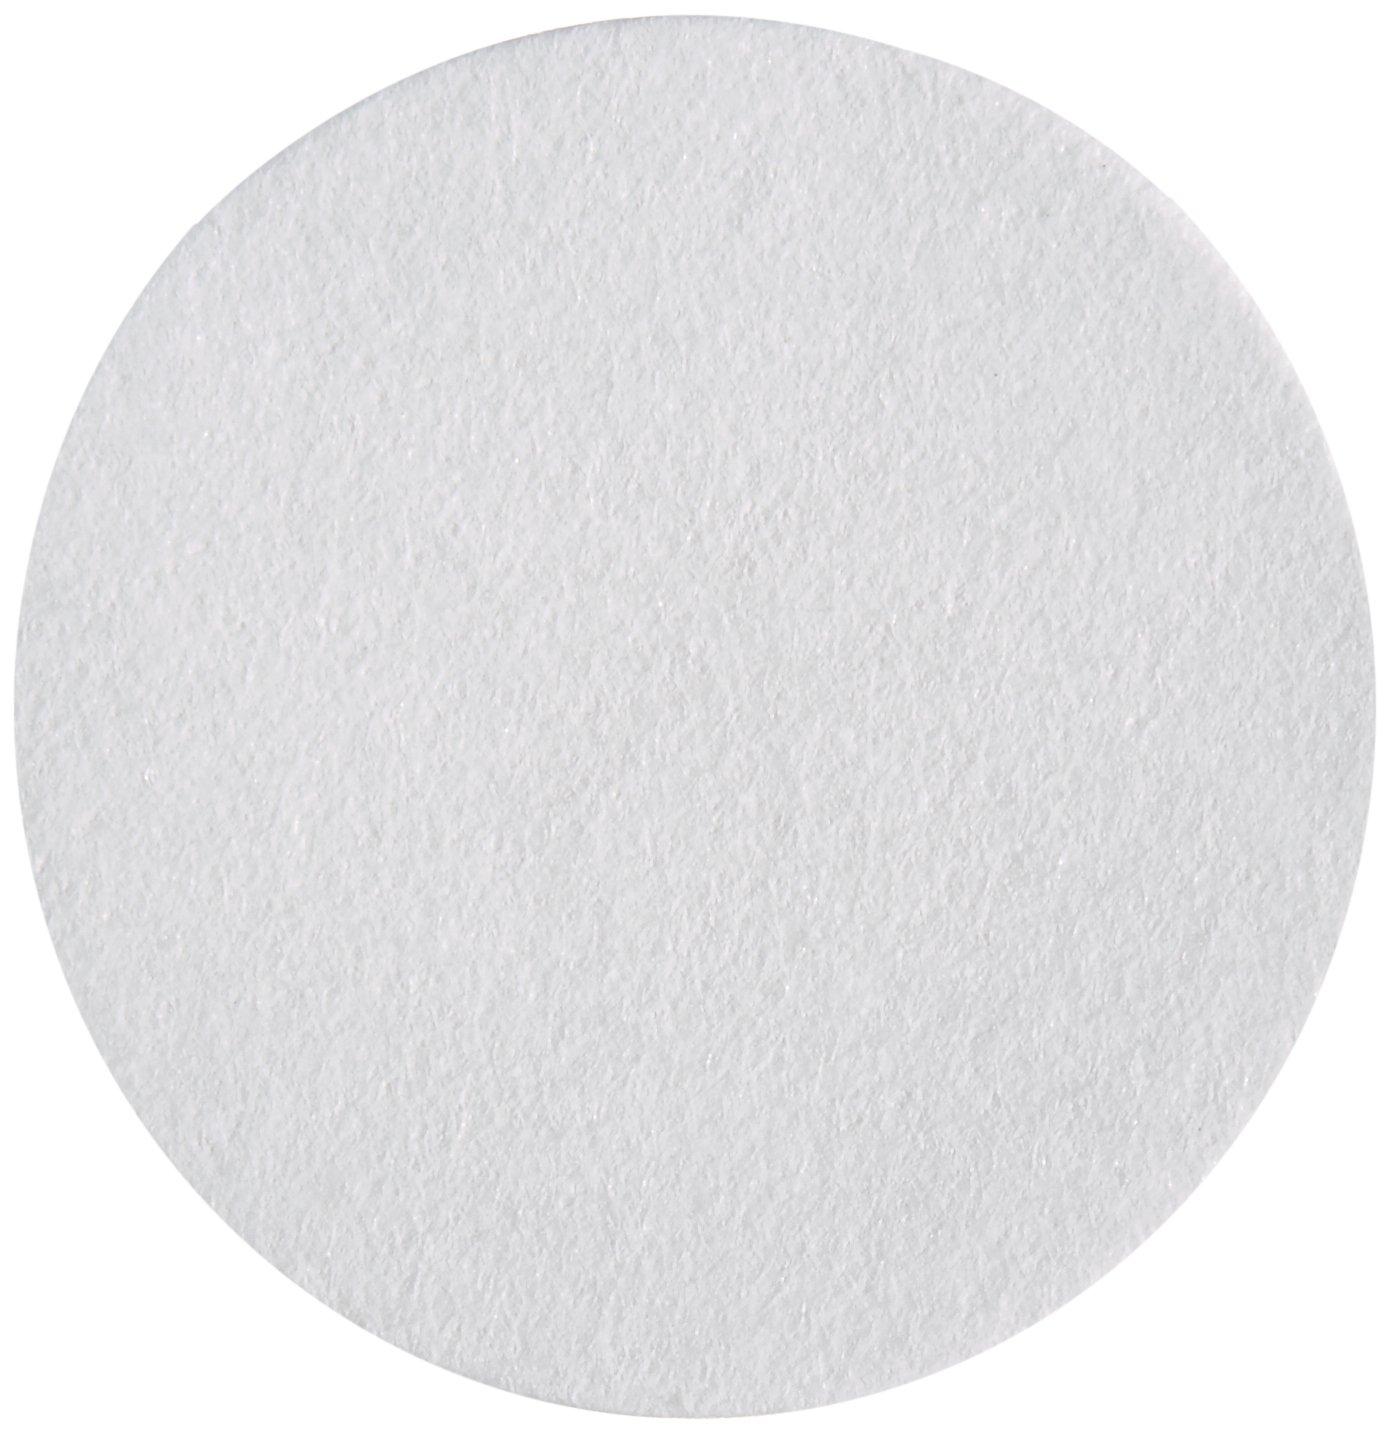 Whatman 1540324 2021 model Quantitative Hardened Low Gr Filter Ash Ranking TOP10 Circles